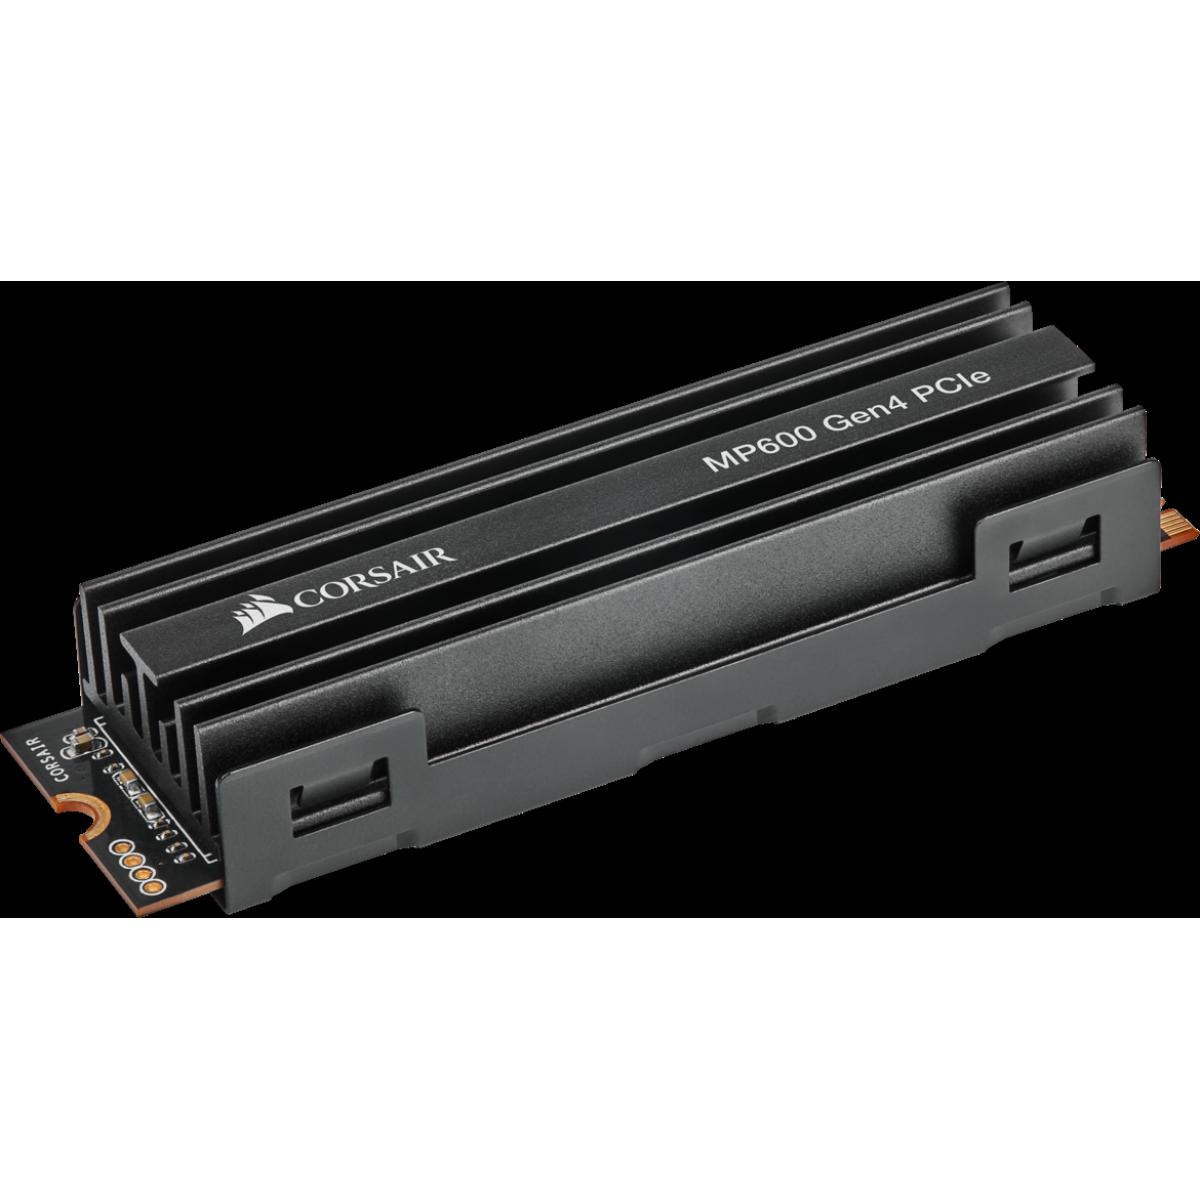 SSD Corsair MP600, 500GB, M.2 2280, NVMe, Leitura 4.950MBs e Gravação 2.500MBs, CSSD-F500GBMP600